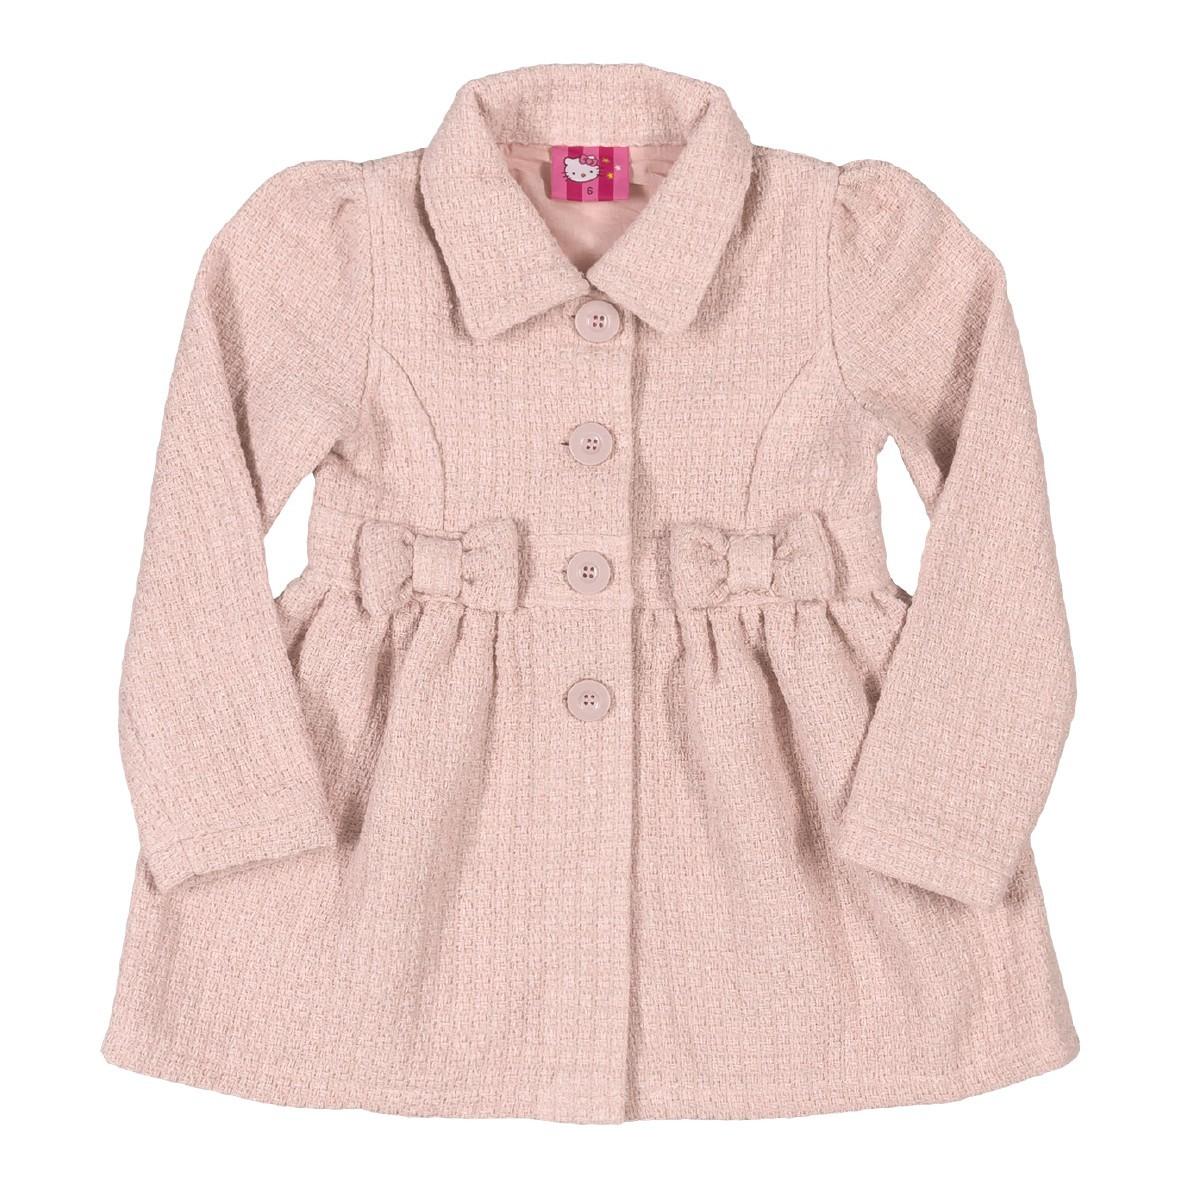 42df681c3f Bizz Store - Casaco Infantil Feminino Hello Kitty Rosa Vinho